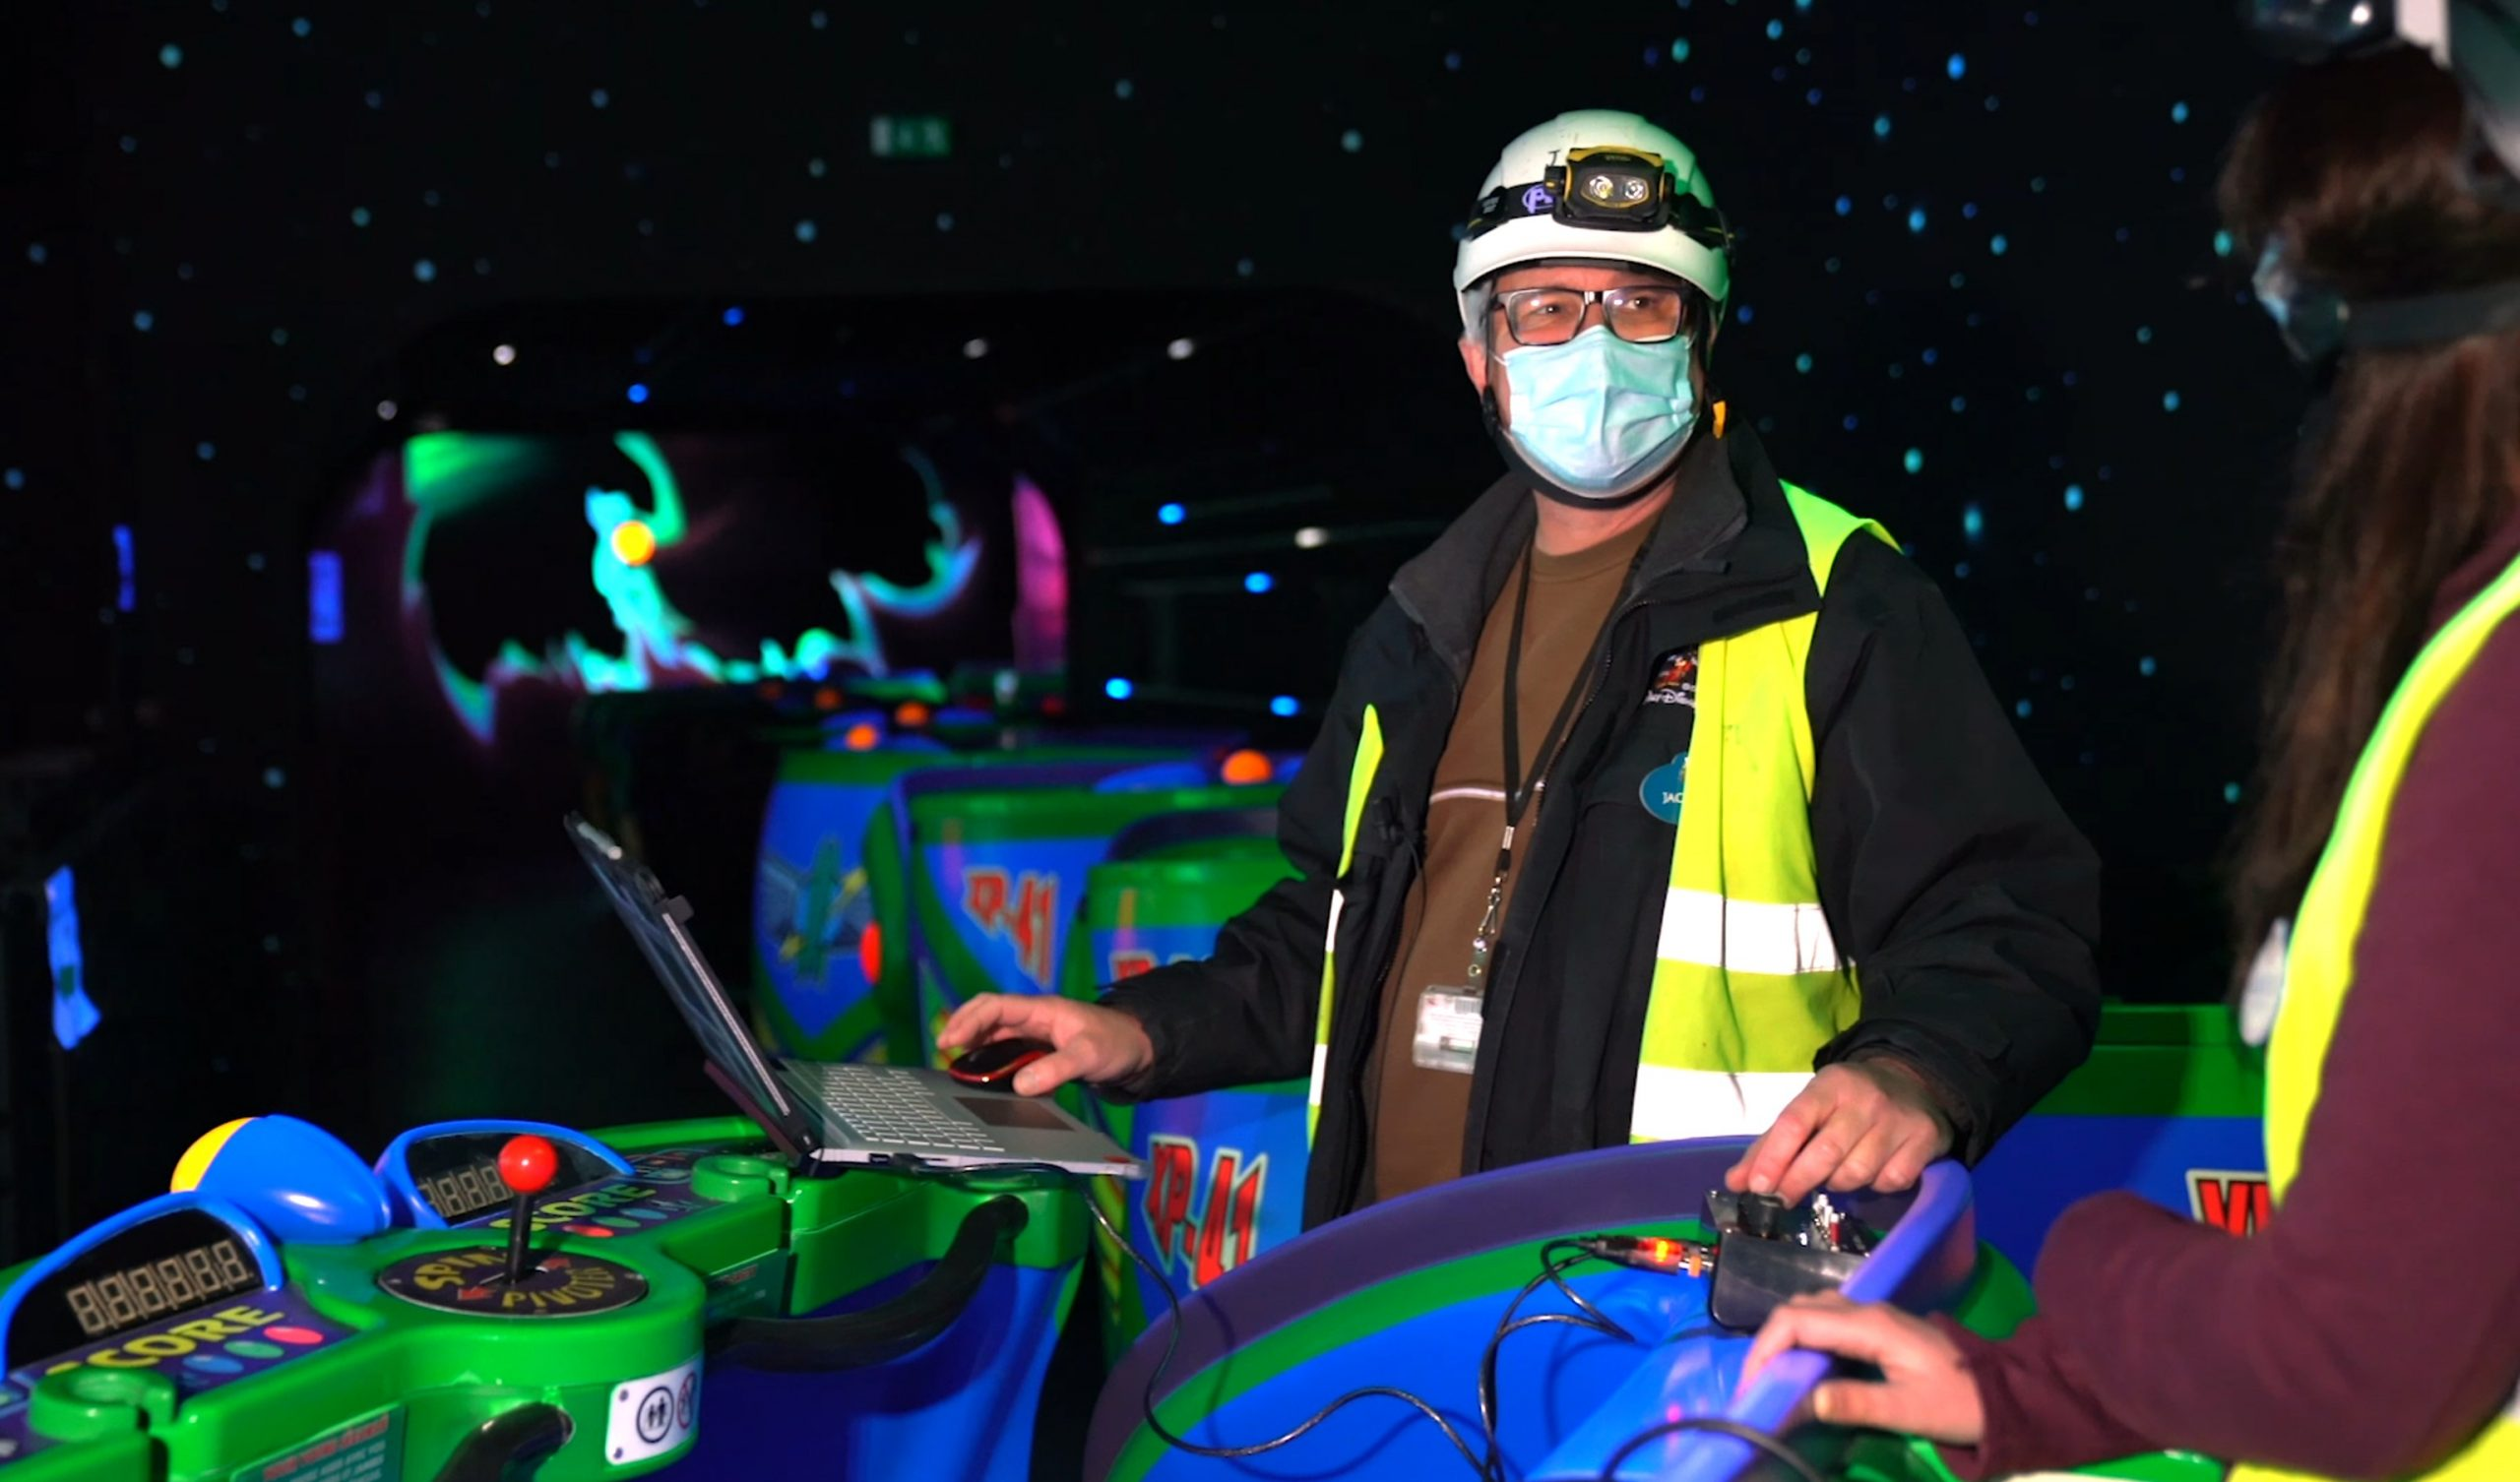 réhabilitation rénovation buzz lightyear laser blast disneyland paris